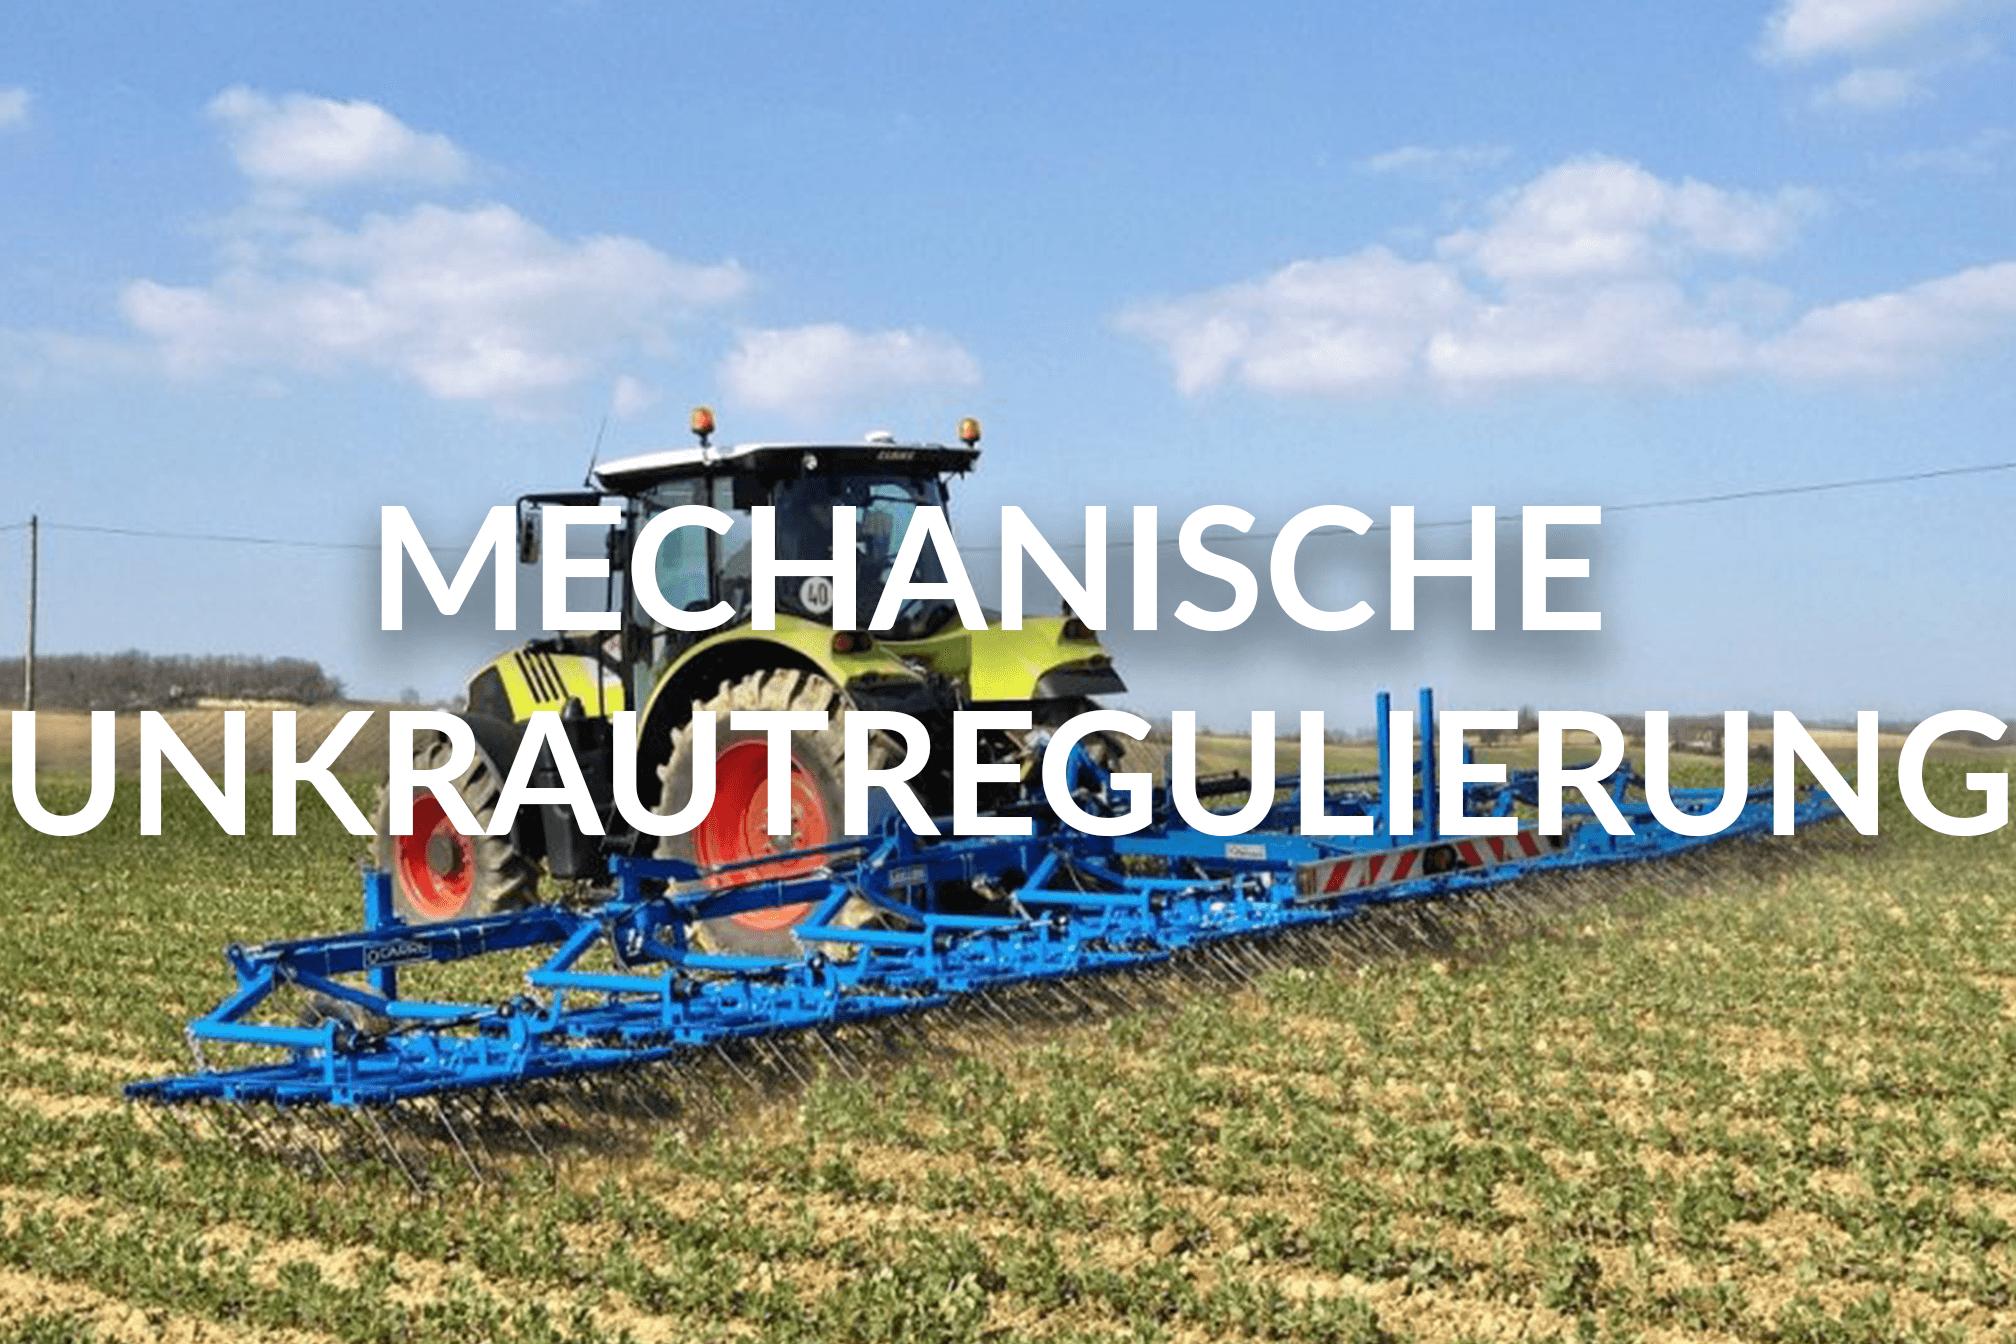 Mechanische Unkrautregulierung